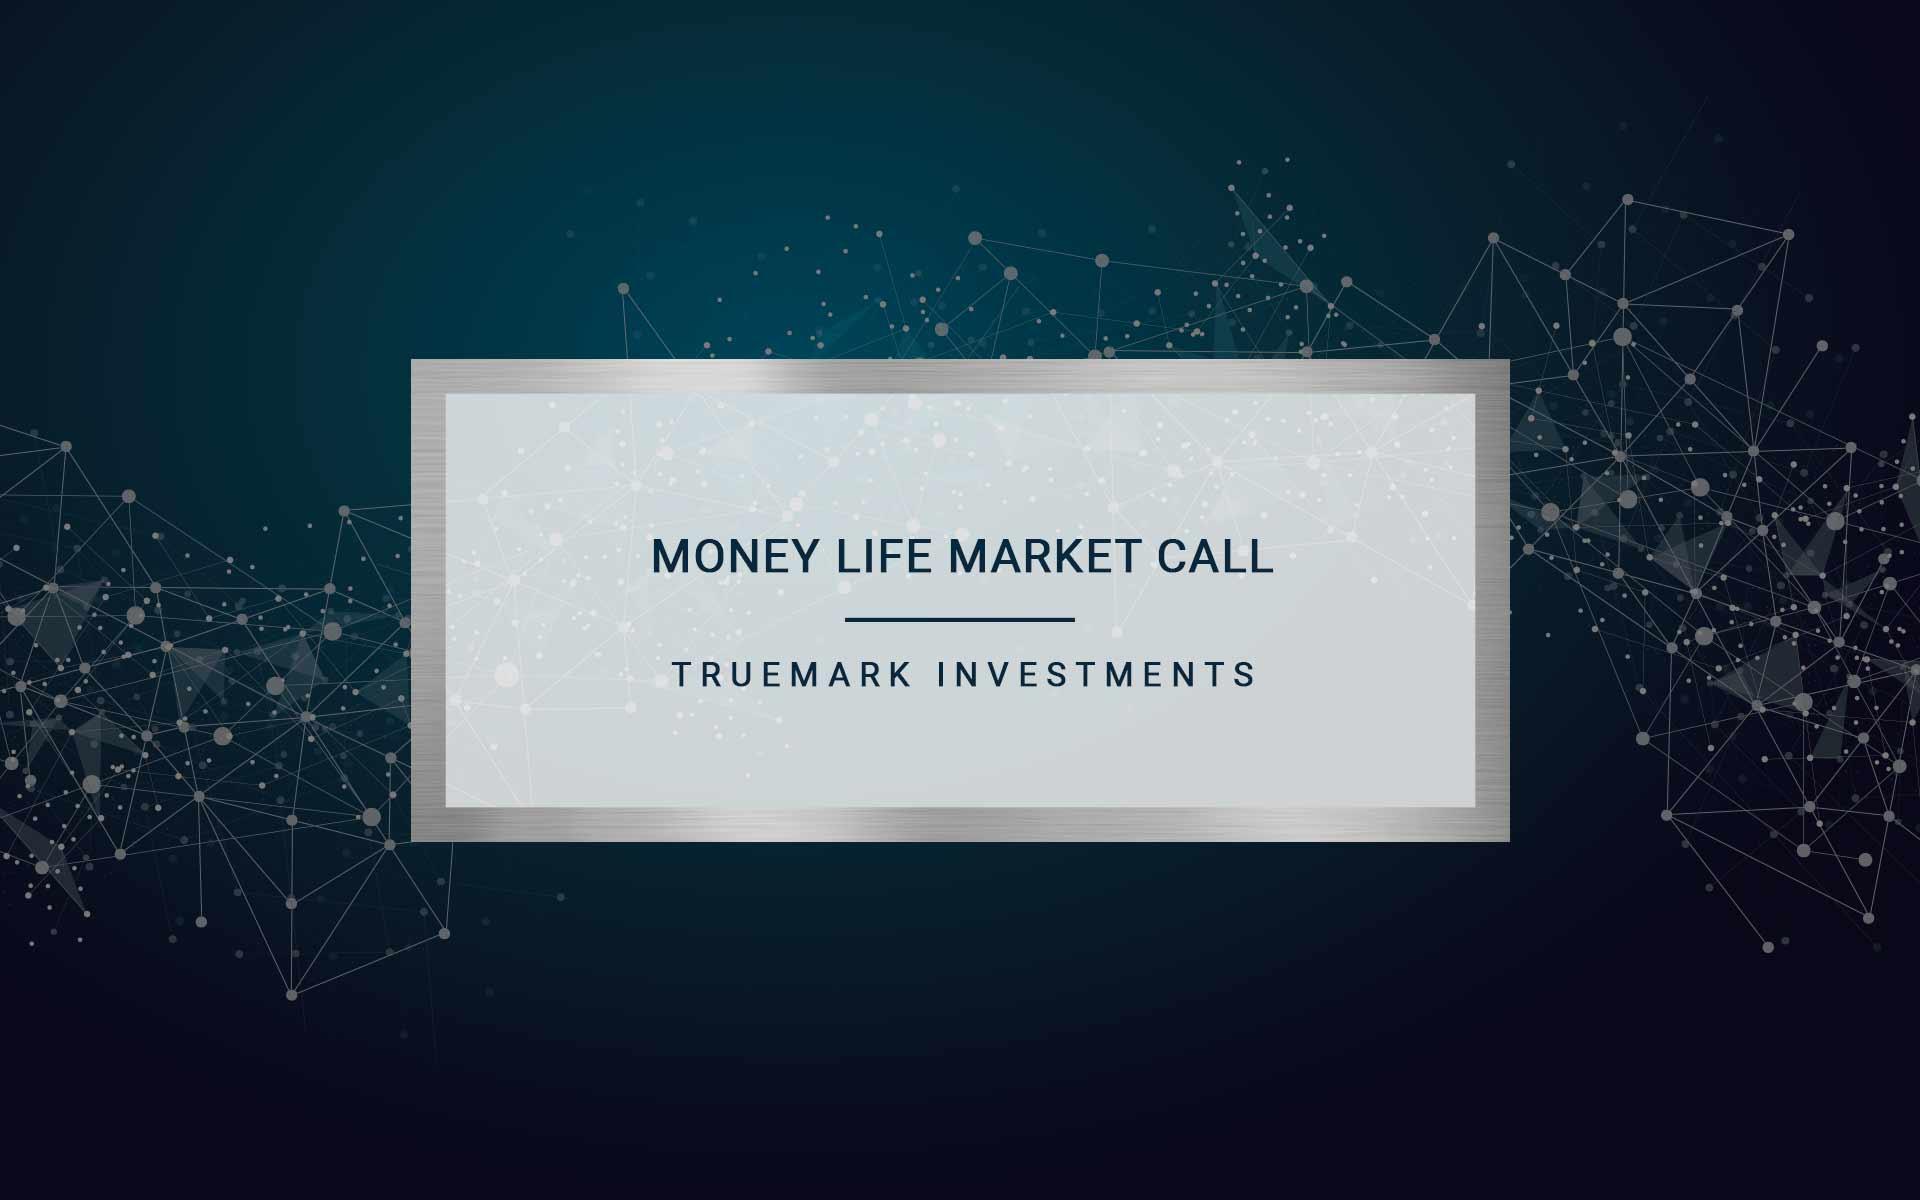 MONEY LIFE MARKET CALL | JORDAN WALDREP